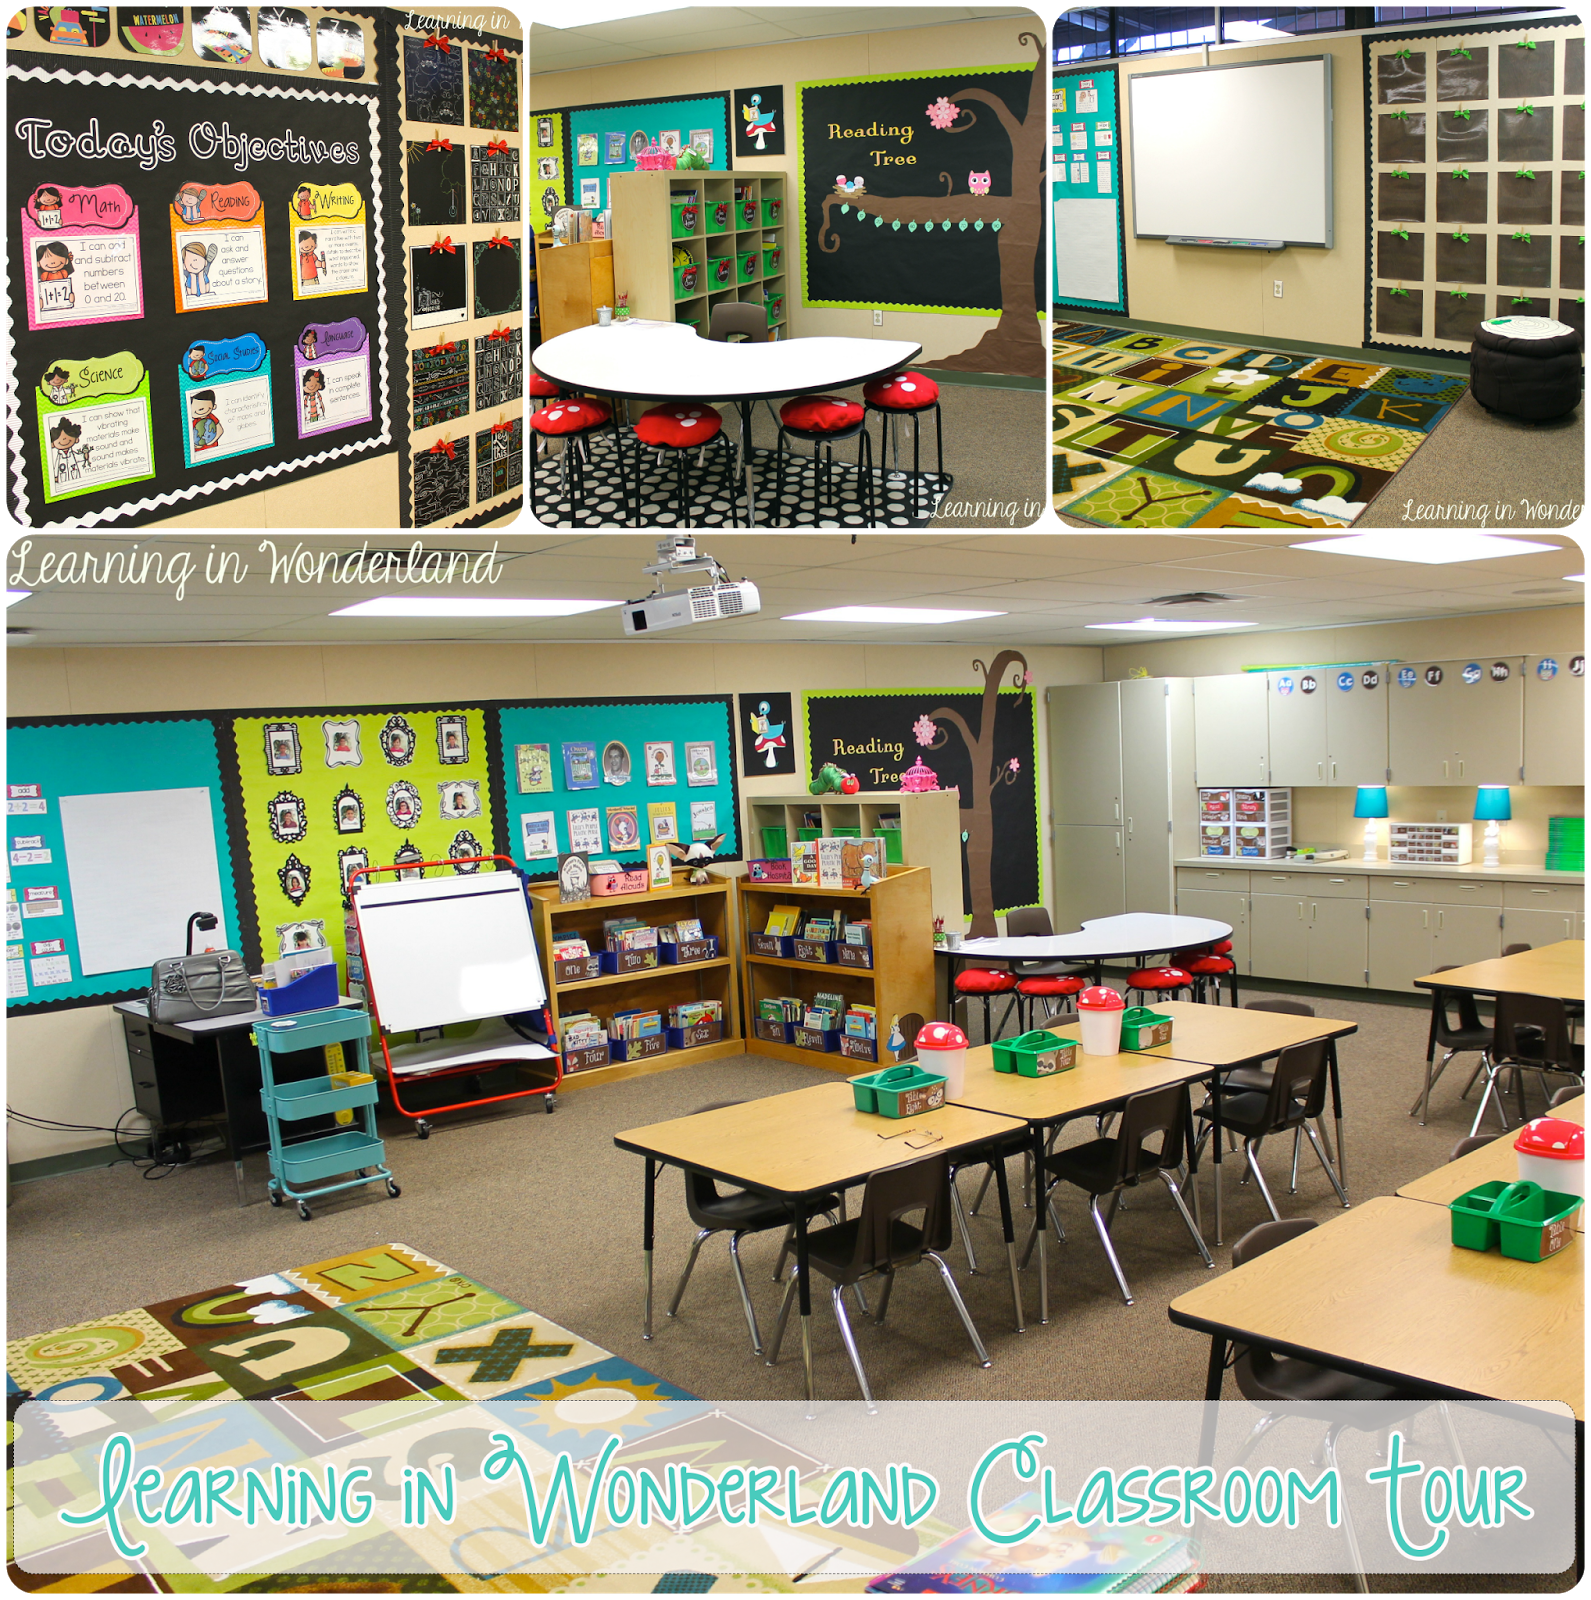 http://www.learninginwonderland.com/2014/08/classroom-tour.html